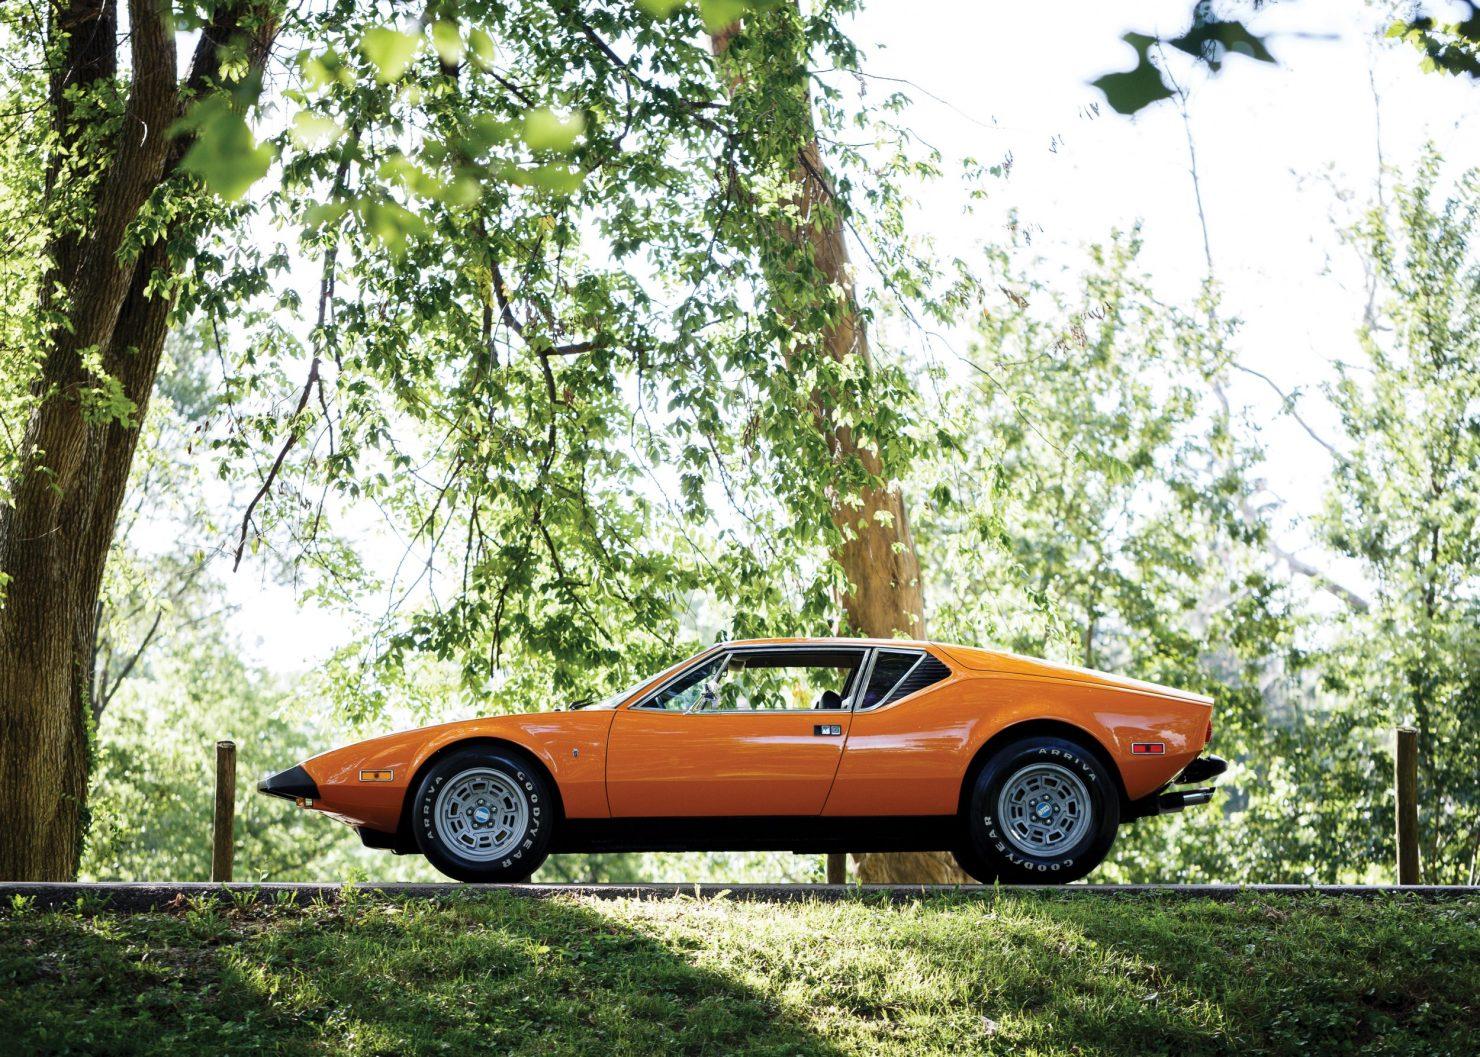 de tomaso pantera 5 1480x1057 - The Last American De Tomaso Pantera